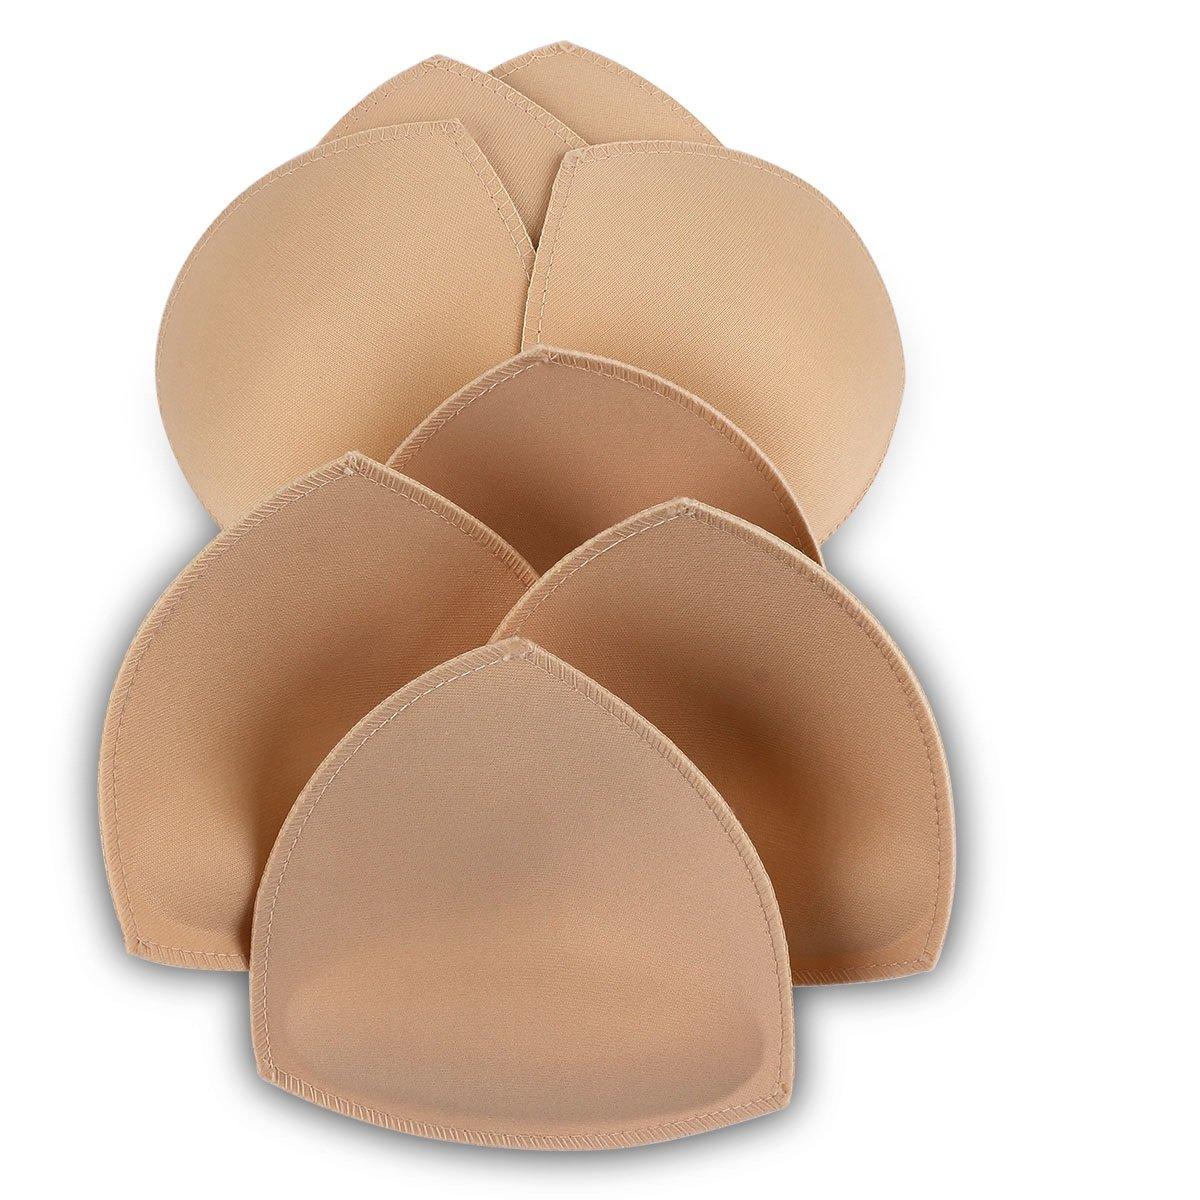 Sermicle Bra Pad Inserts 4 Pairs, Vekey Bra Pads Sewed Massaged Sports Bra A/B Cup Beige)